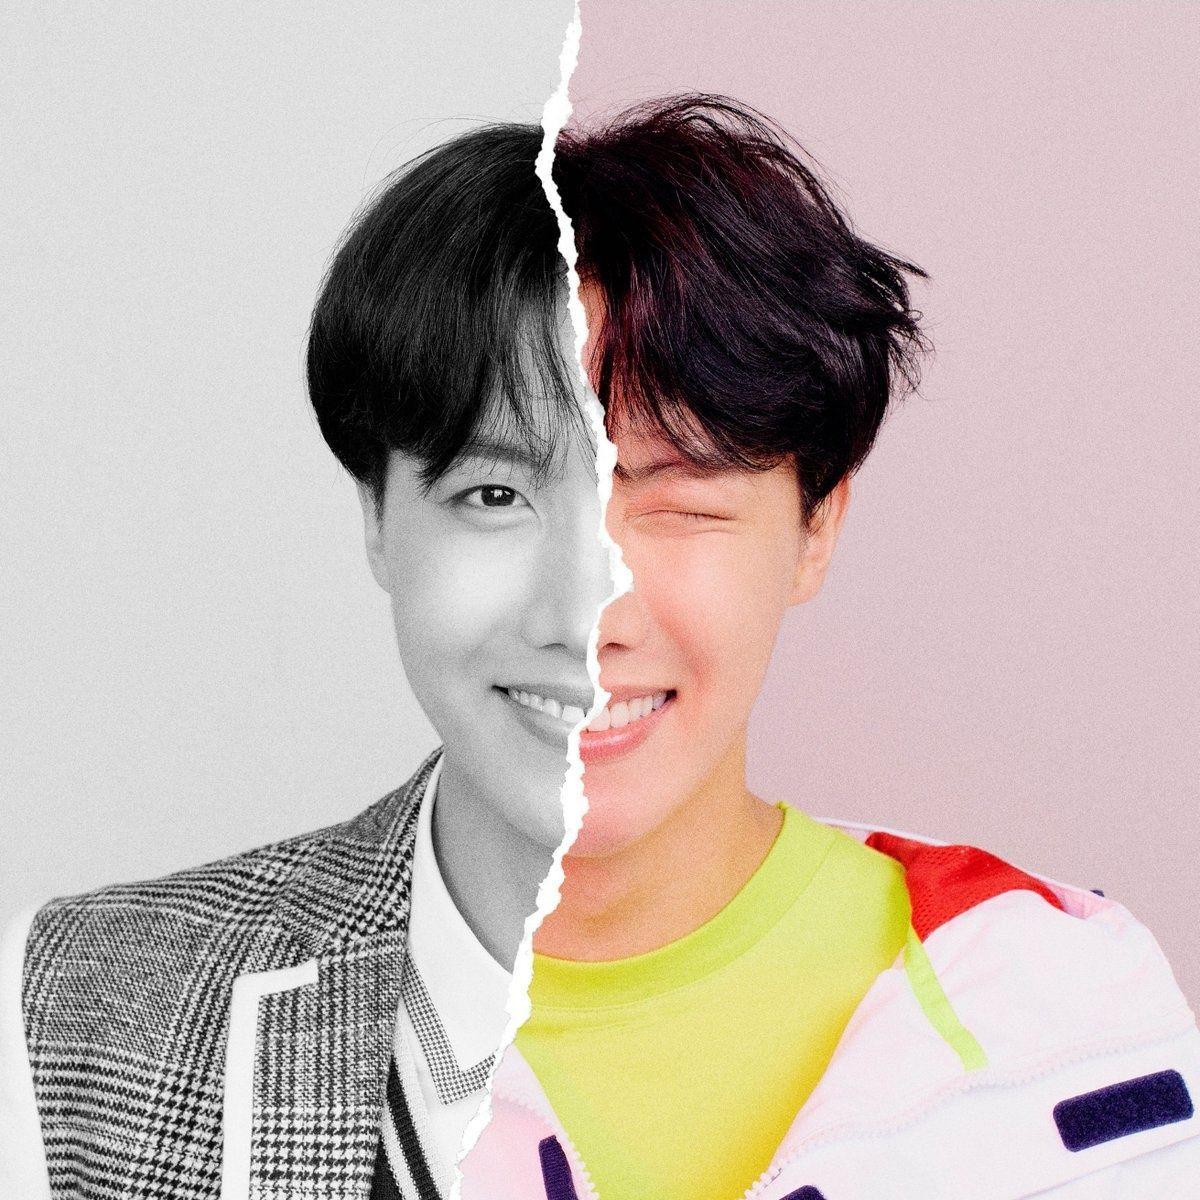 Cute Jung Kook BTS Wallpapers